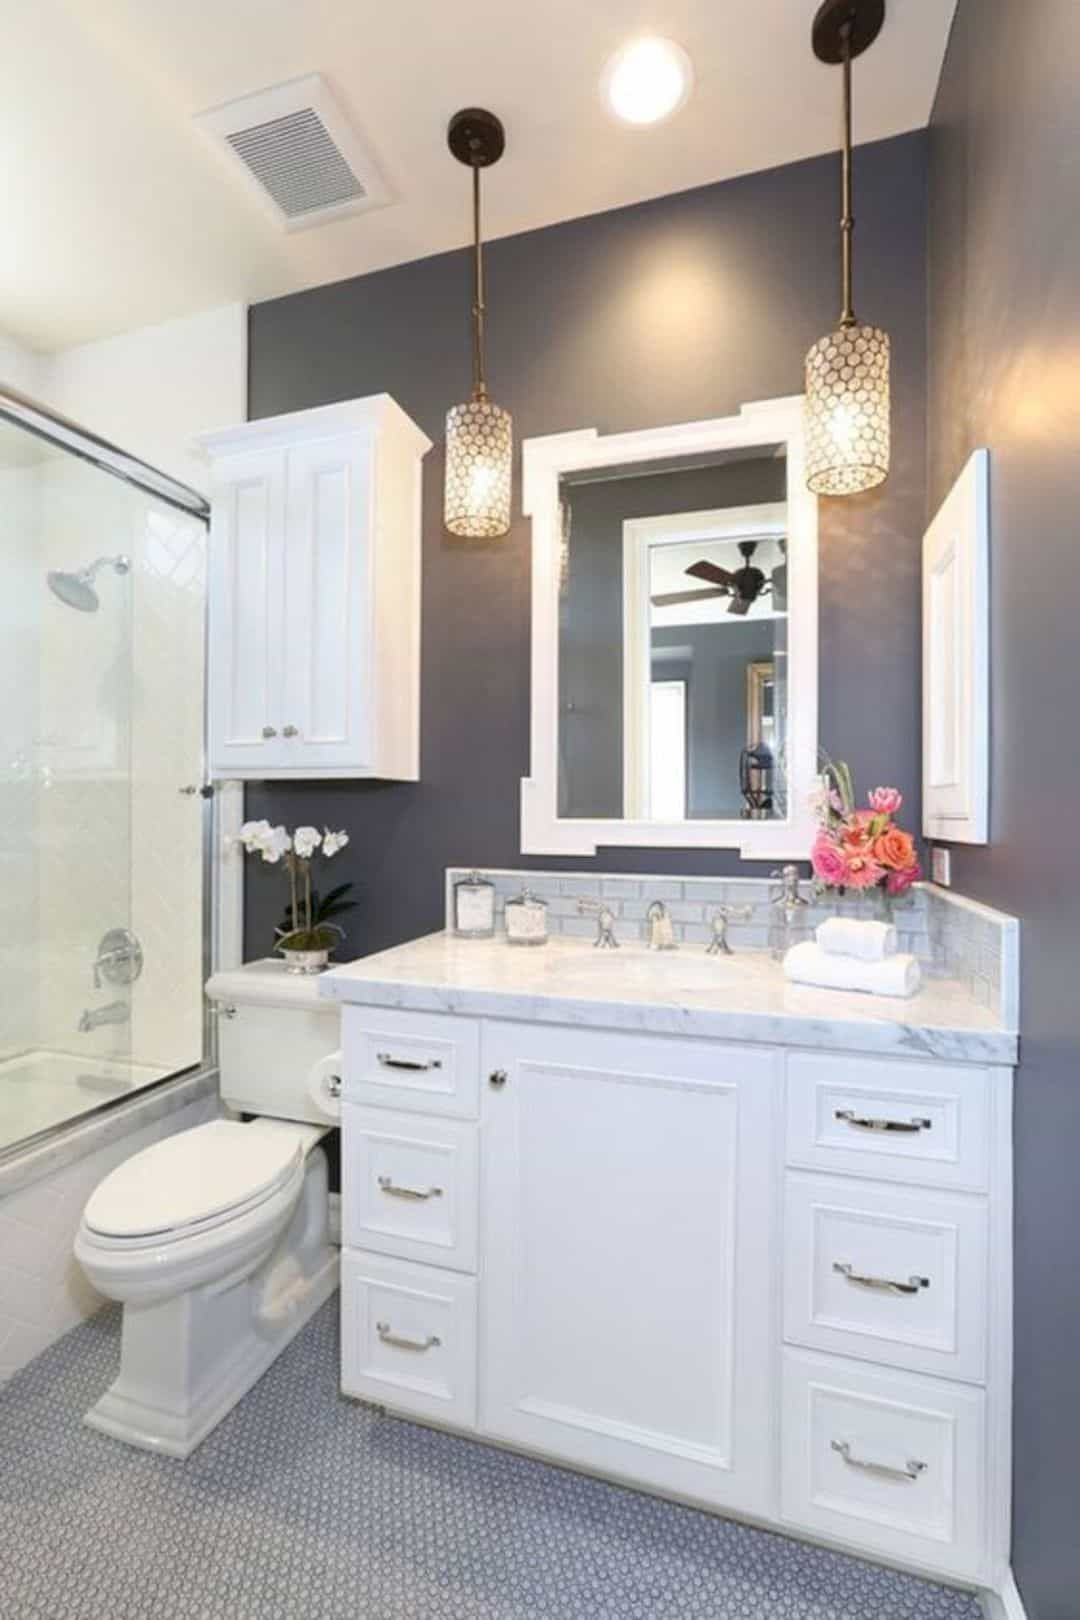 16 small bathroom renovation ideas beautiful small on bathroom renovation ideas modern id=65891